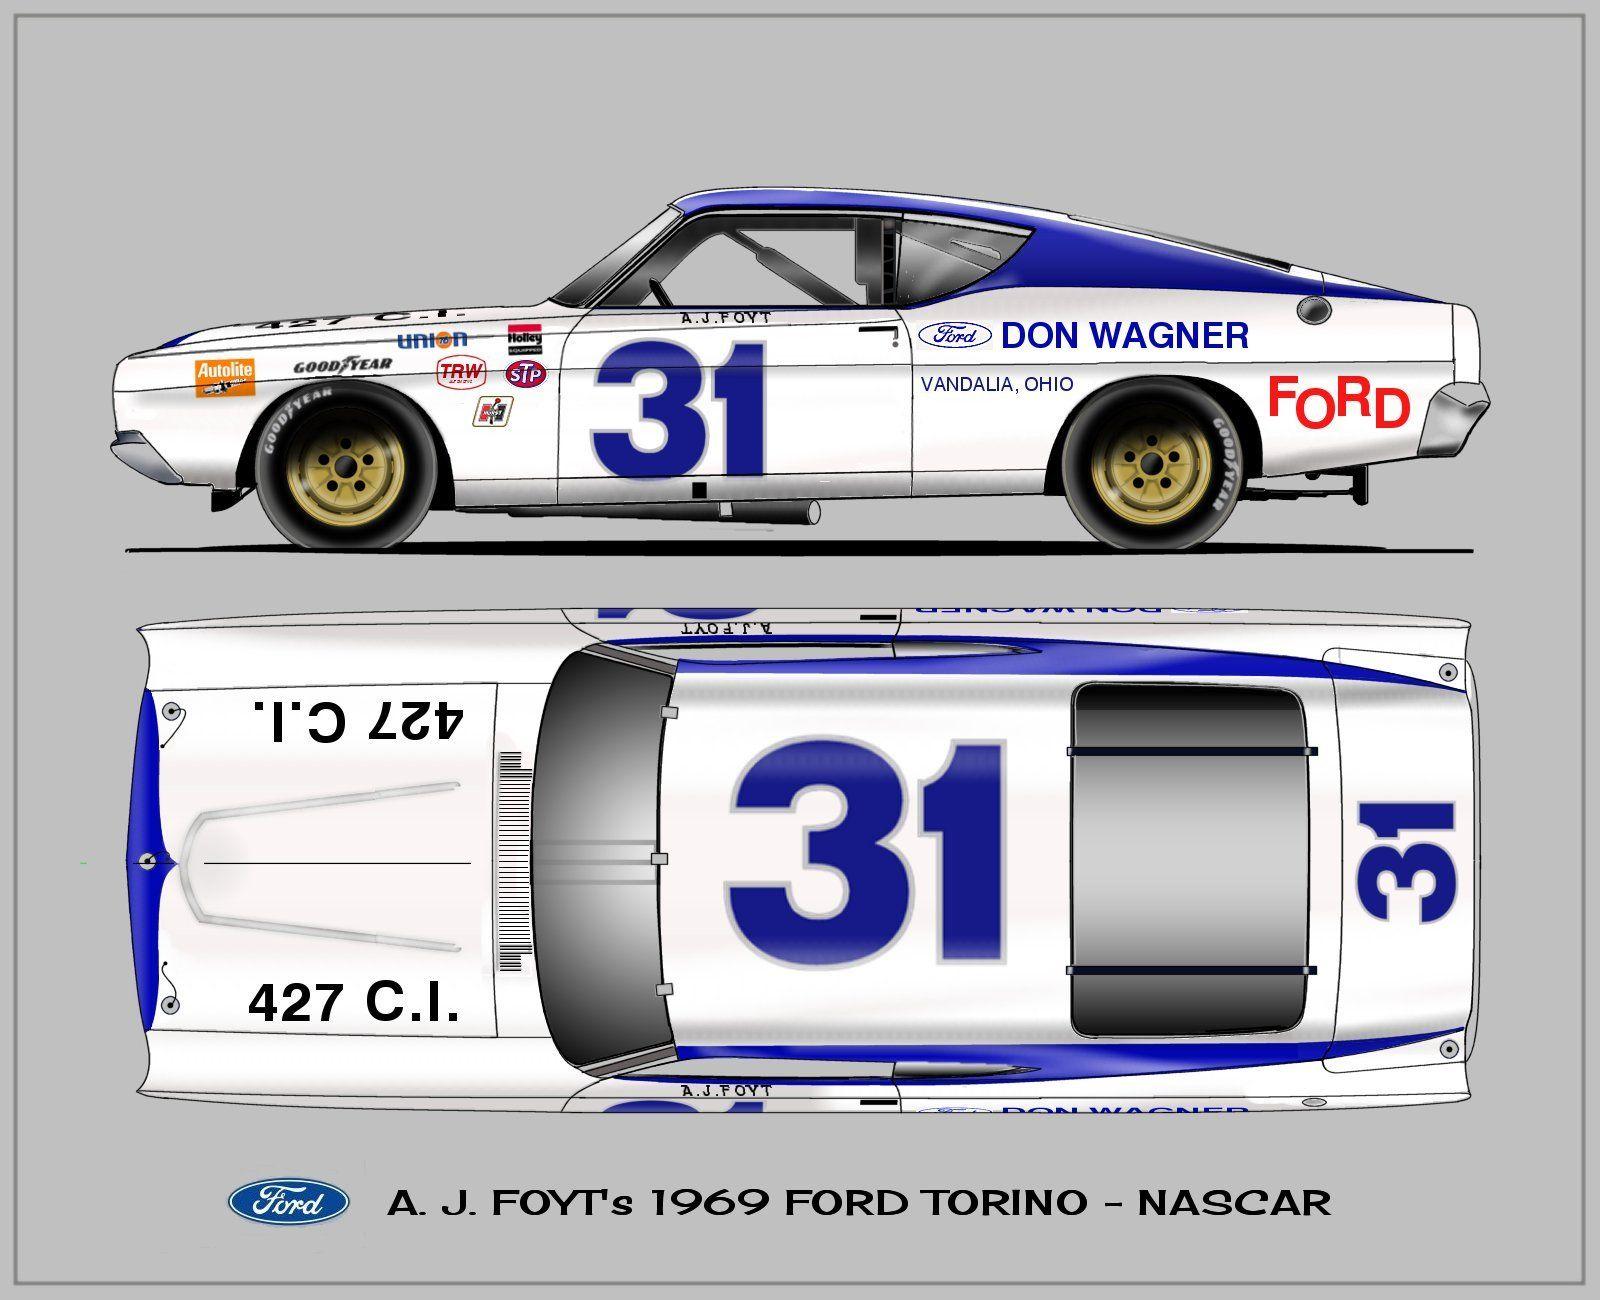 Ford Torino AJ Foyt NASCAR   Muscle Cars   Pinterest   Lkw und ...